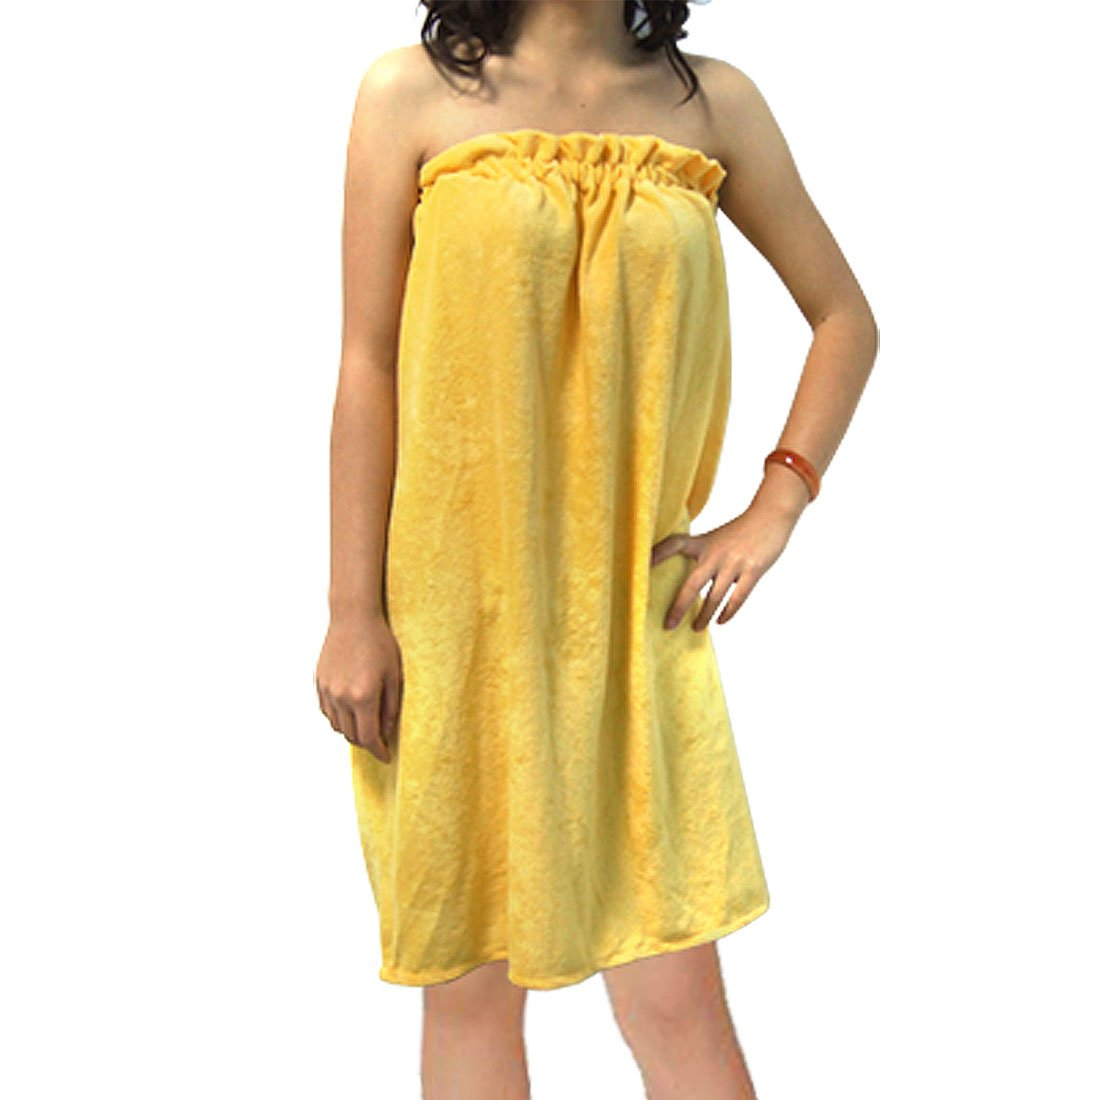 Amazon.com: Sleepwear & Robes Sets: Clothing